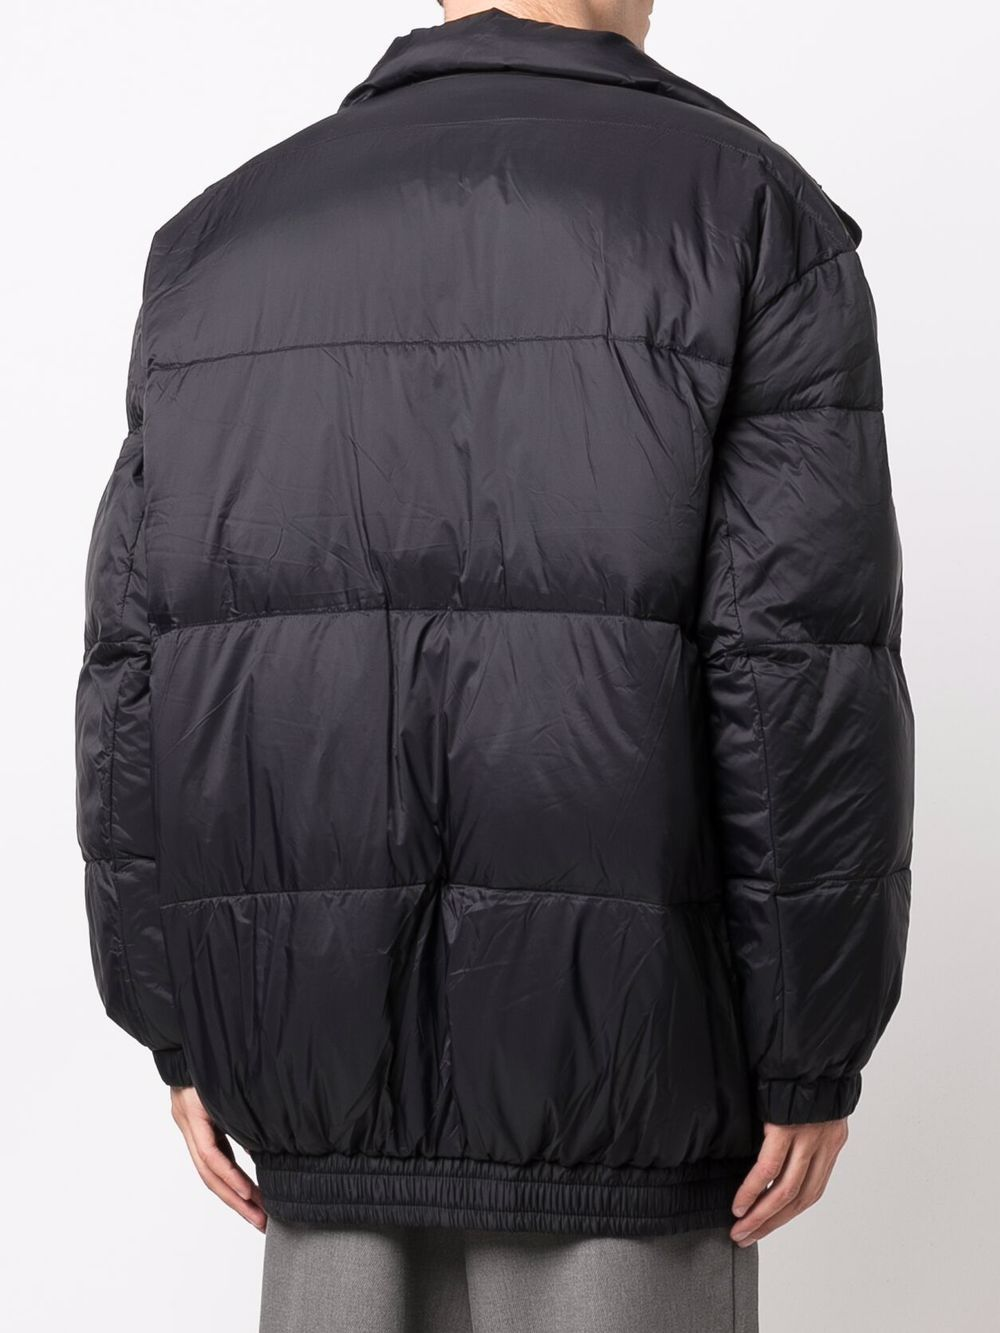 dilyam down jacket man black ISABEL MARANT   Coats   21AMA1032-21A002H01BK